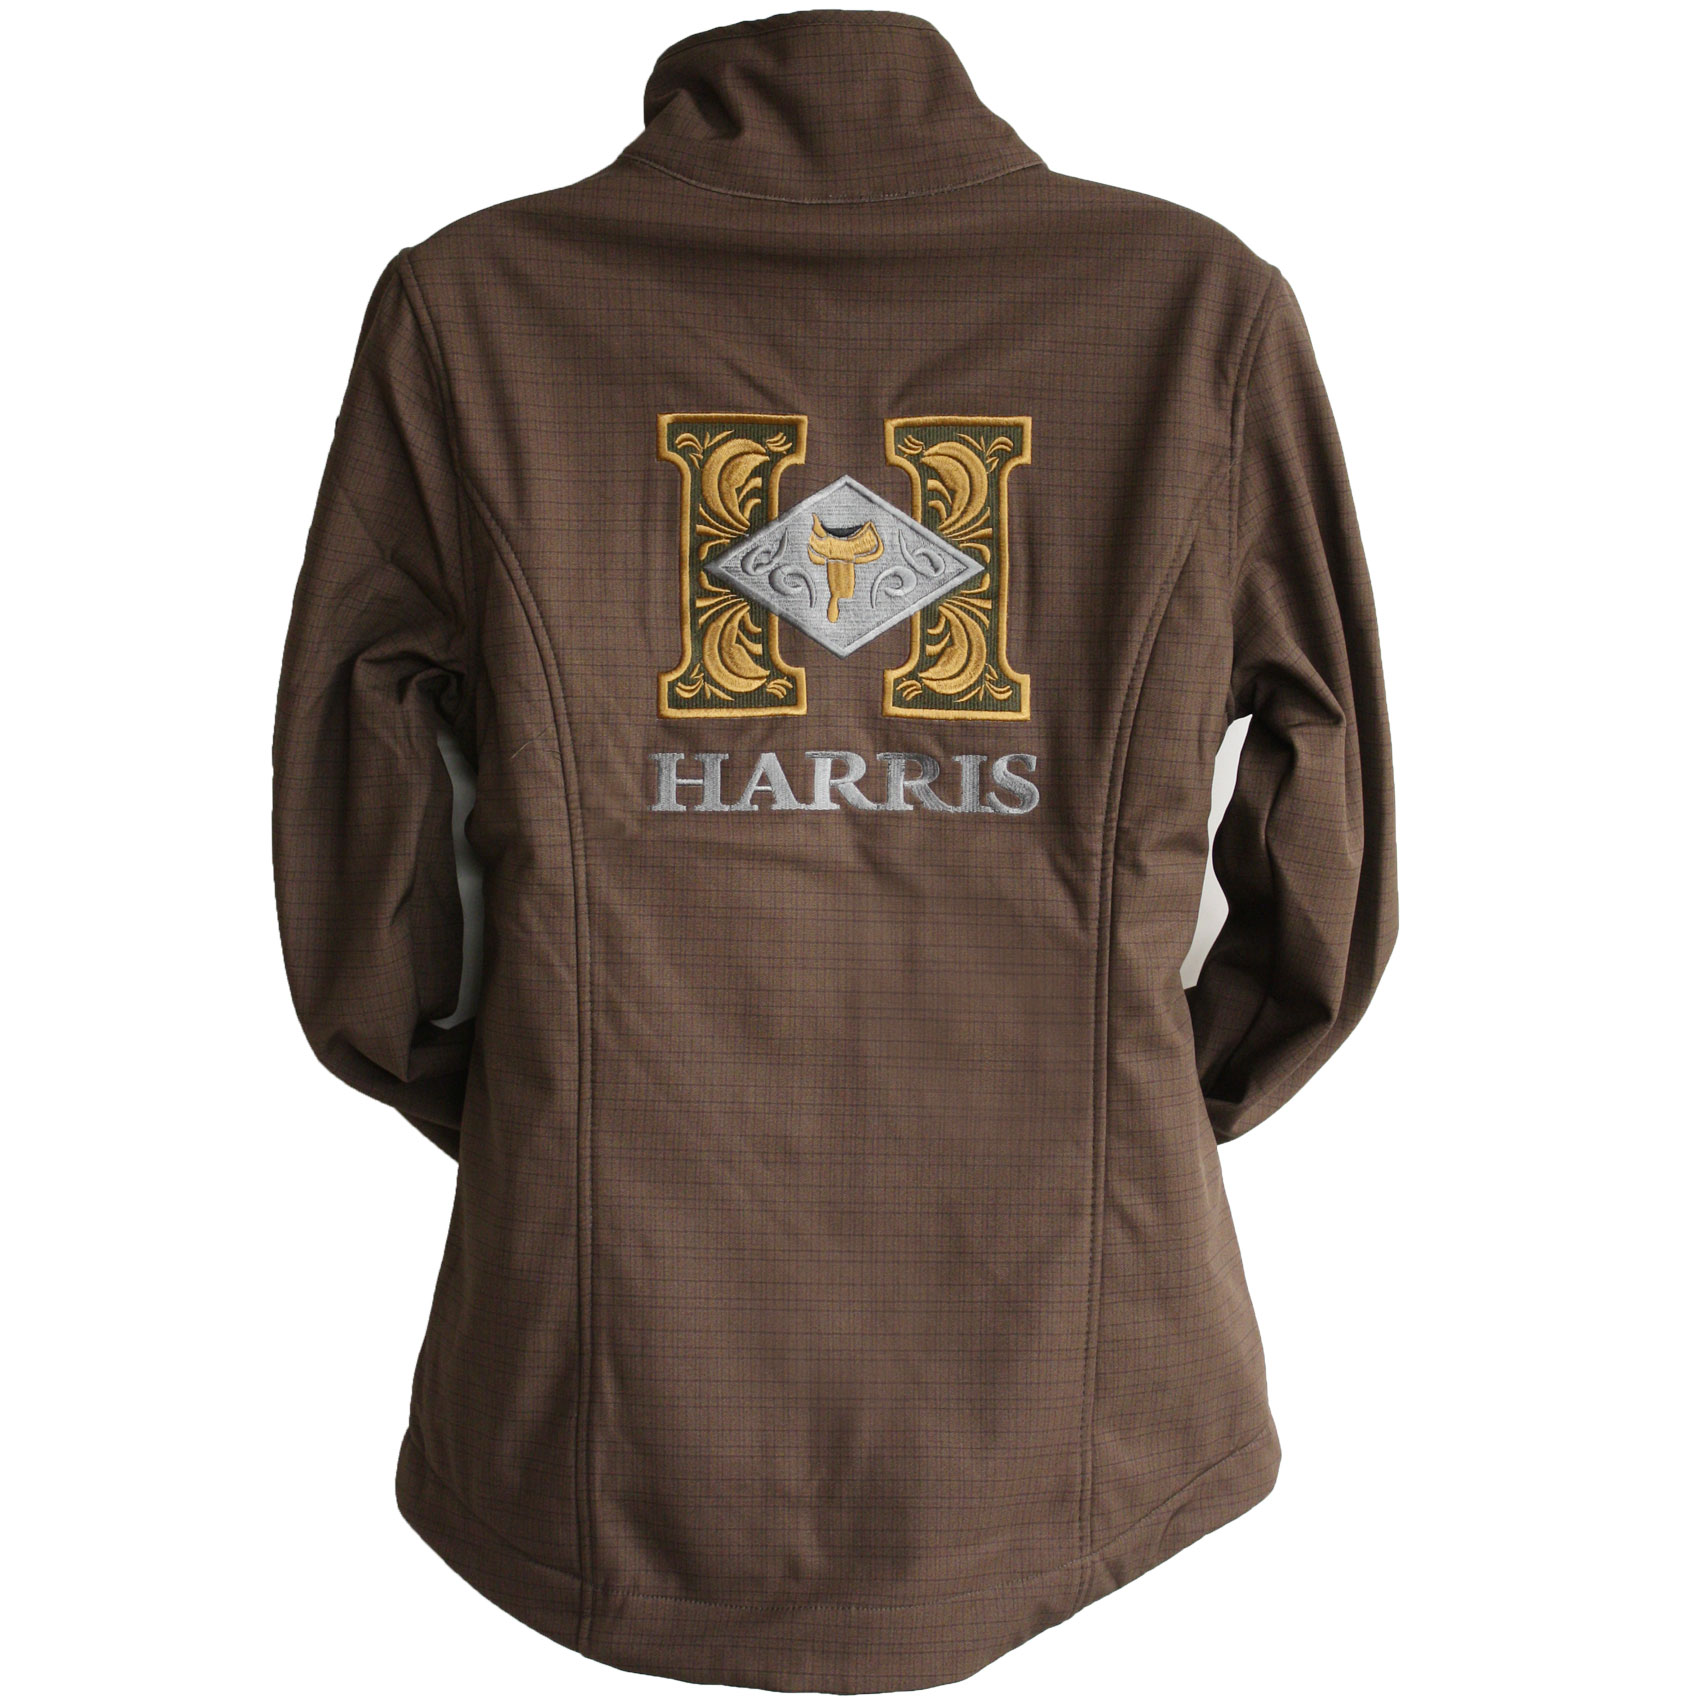 Cinch Brown Printed Bonded Jacket Harris Leather Amp Silverworks Legendary Handmade Saddles